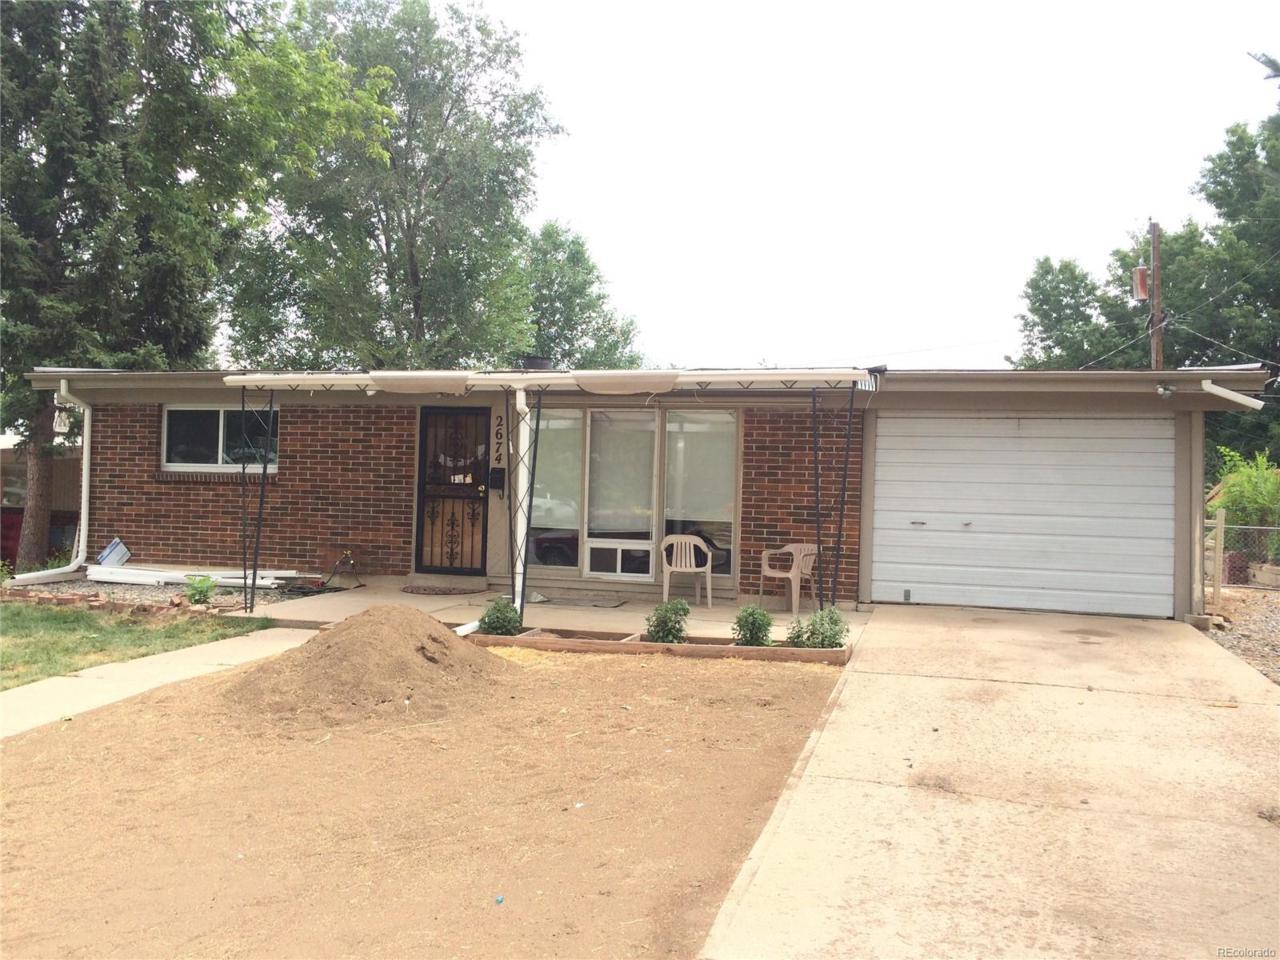 2674 S Patton Court, Denver, CO 80219 (MLS #1583205) :: 8z Real Estate